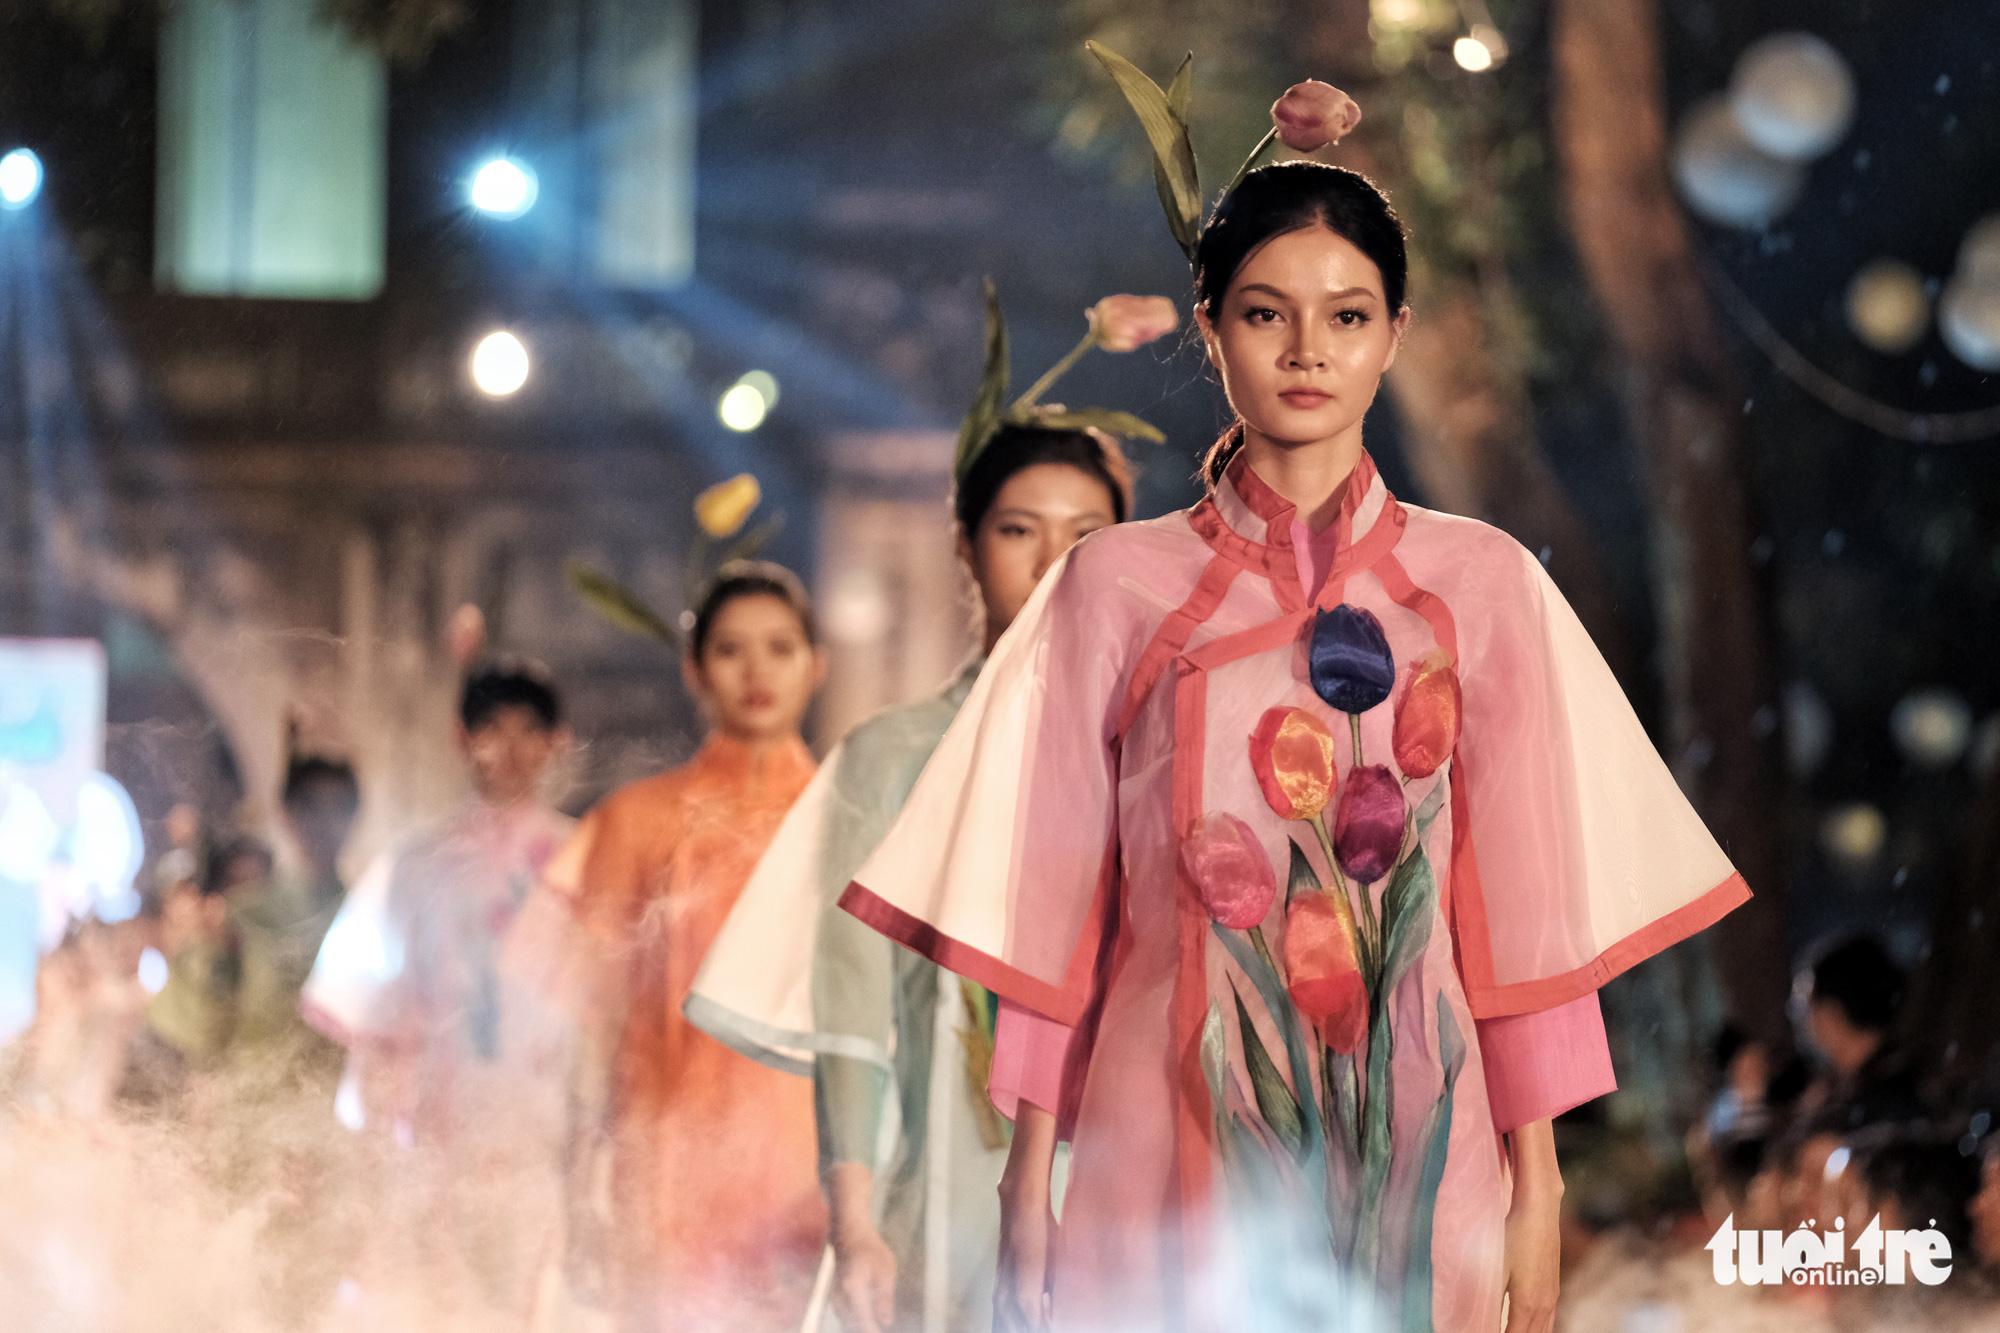 Hanoi ao dai fashion show honors Vietnam's heritage, women beauty